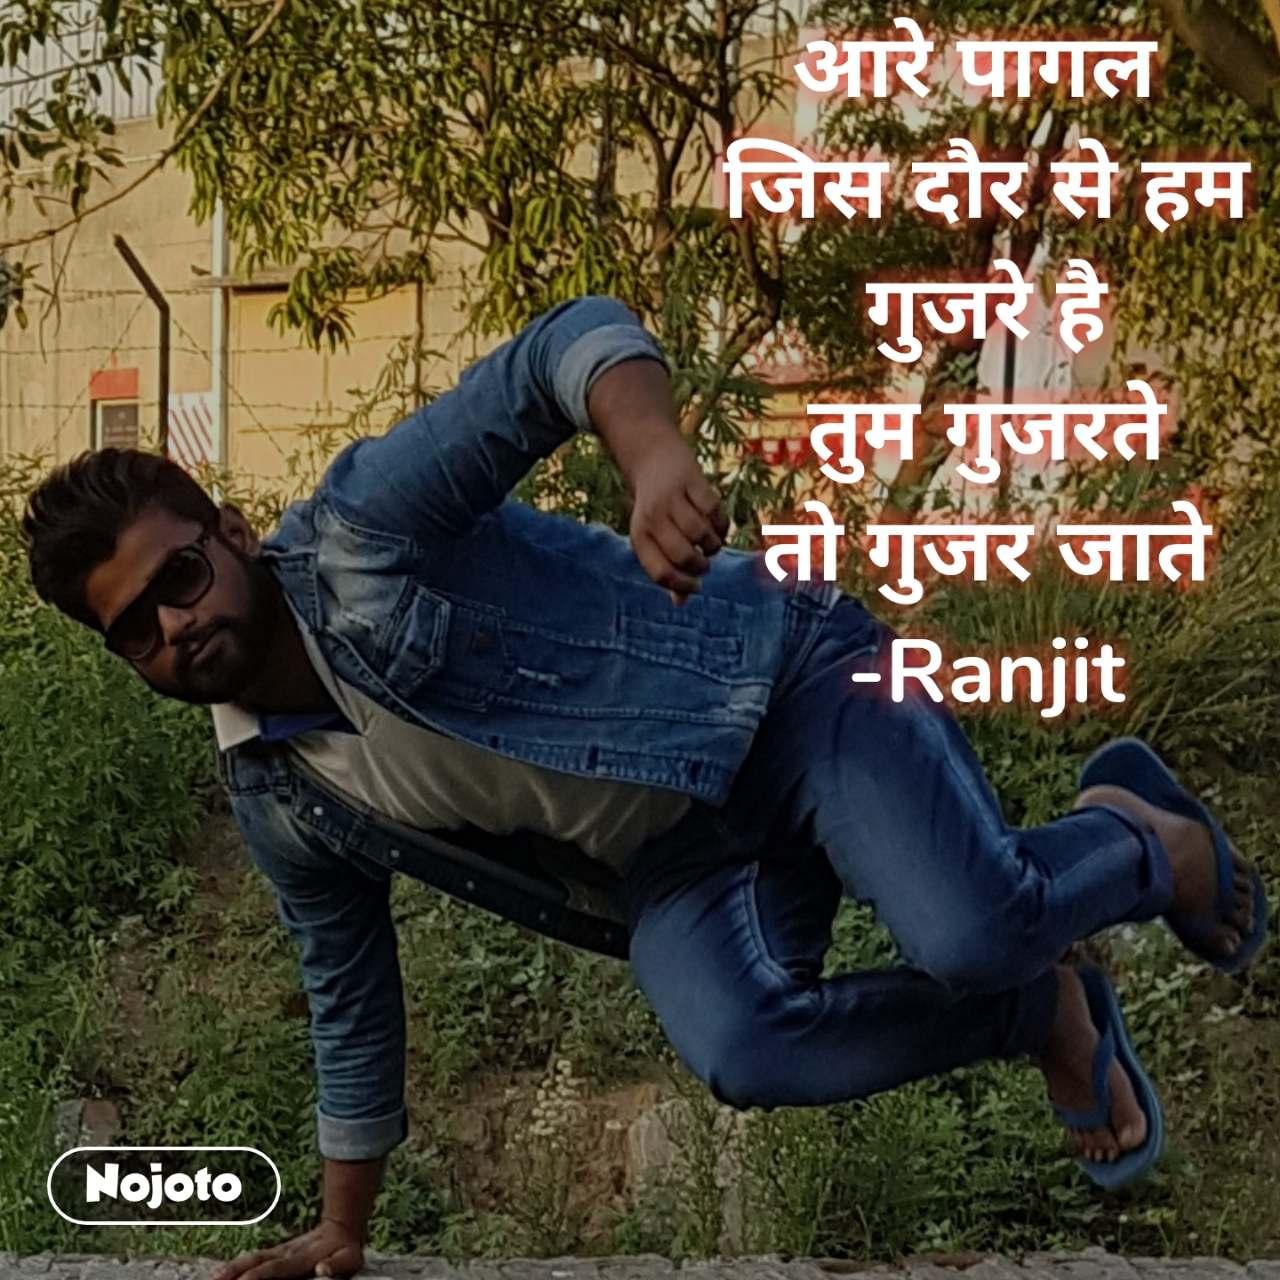 आरे पागल  जिस दौर से हम गुजरे है तुम गुजरते तो गुजर जाते -Ranjit